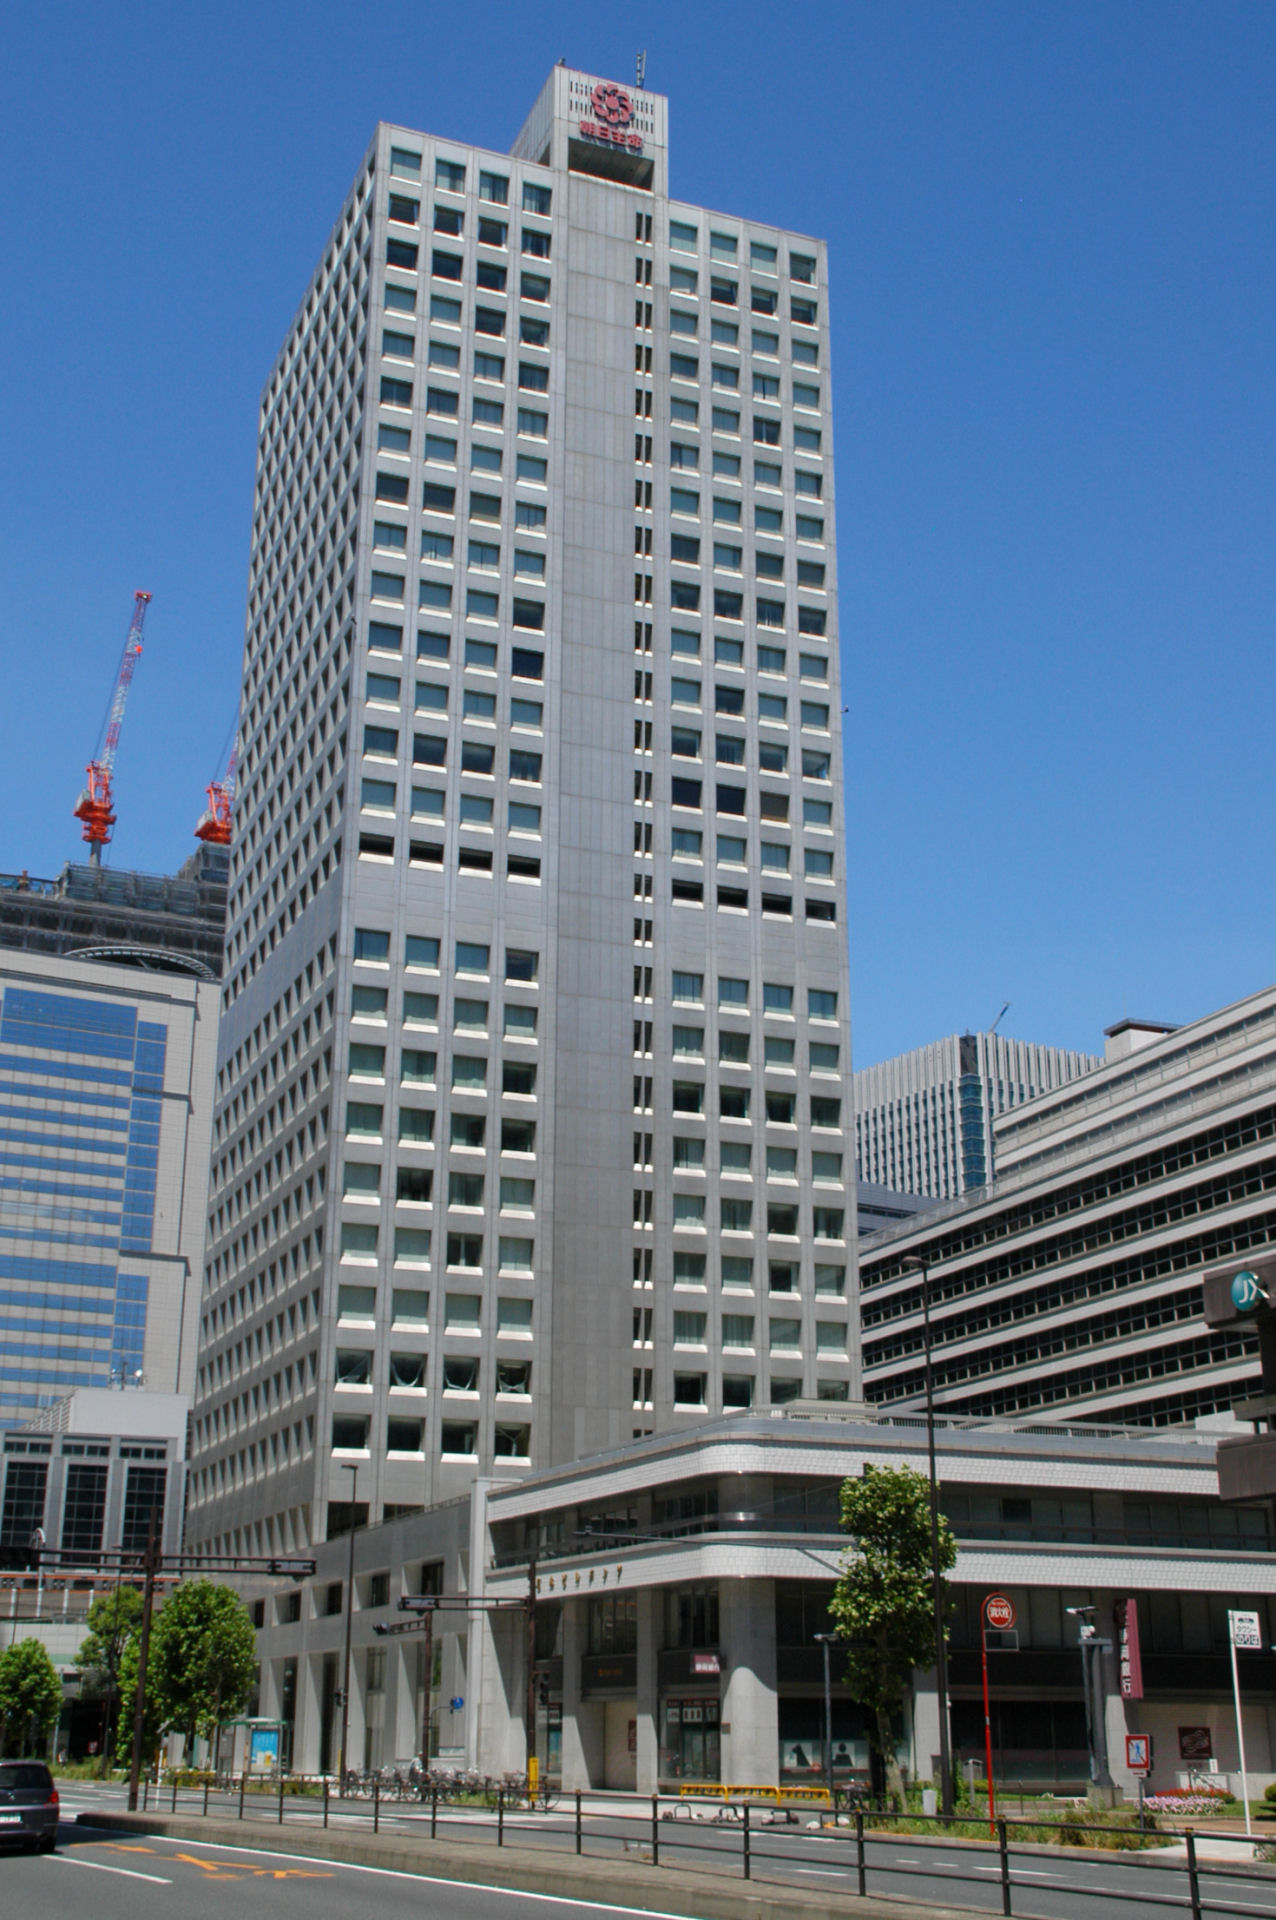 tokiwa0031.jpg